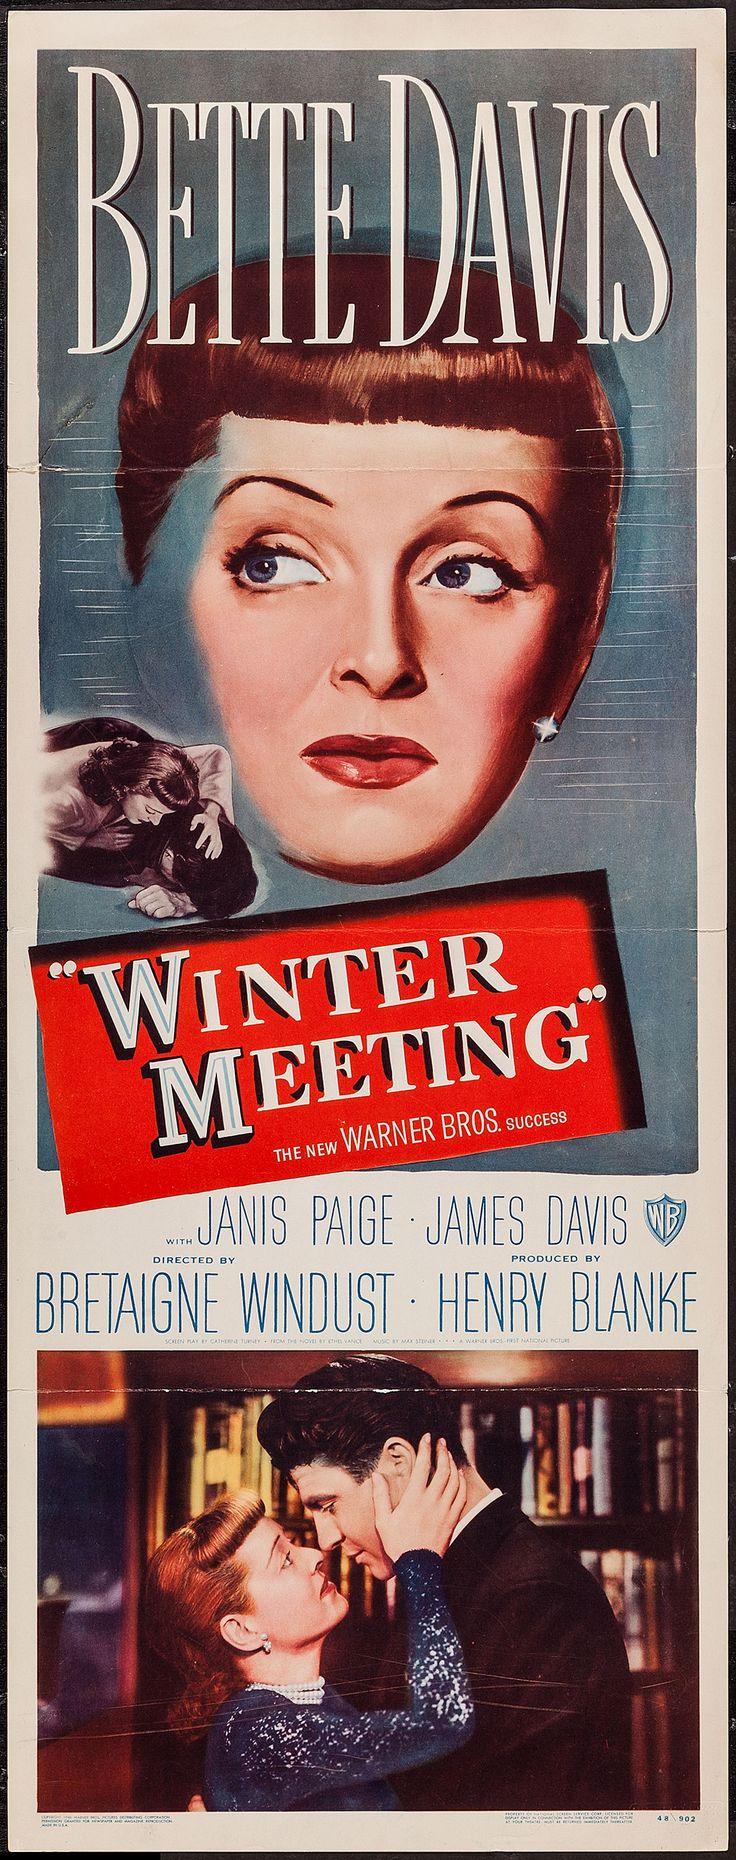 Winter Meeting (1948) Stars: Bette Davis, Janis Paige, Jim Davis, John Hoyt, Florence Bates, Walter Baldwin ~ Director: Bretaigne Windust